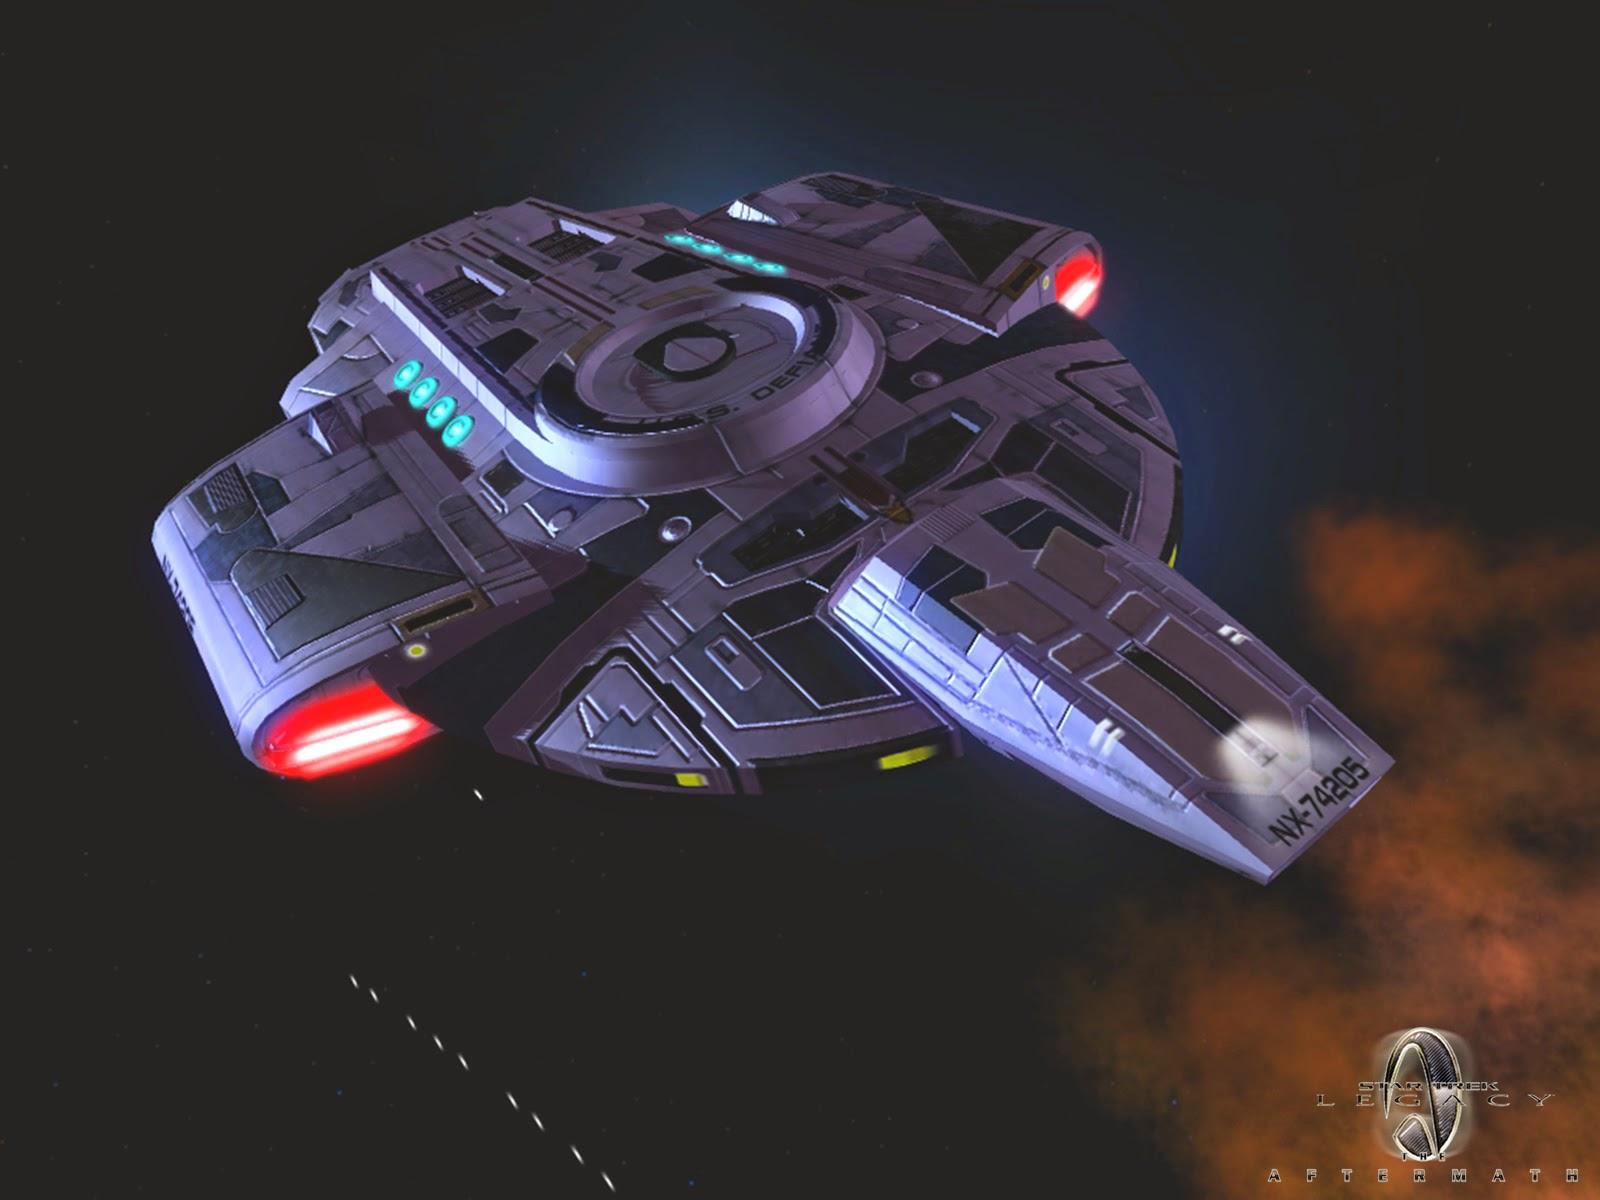 uss defiant nx 74205 uss enterprise ncc 1701 uss enterprise ncc 1701 a Star Trek Uss